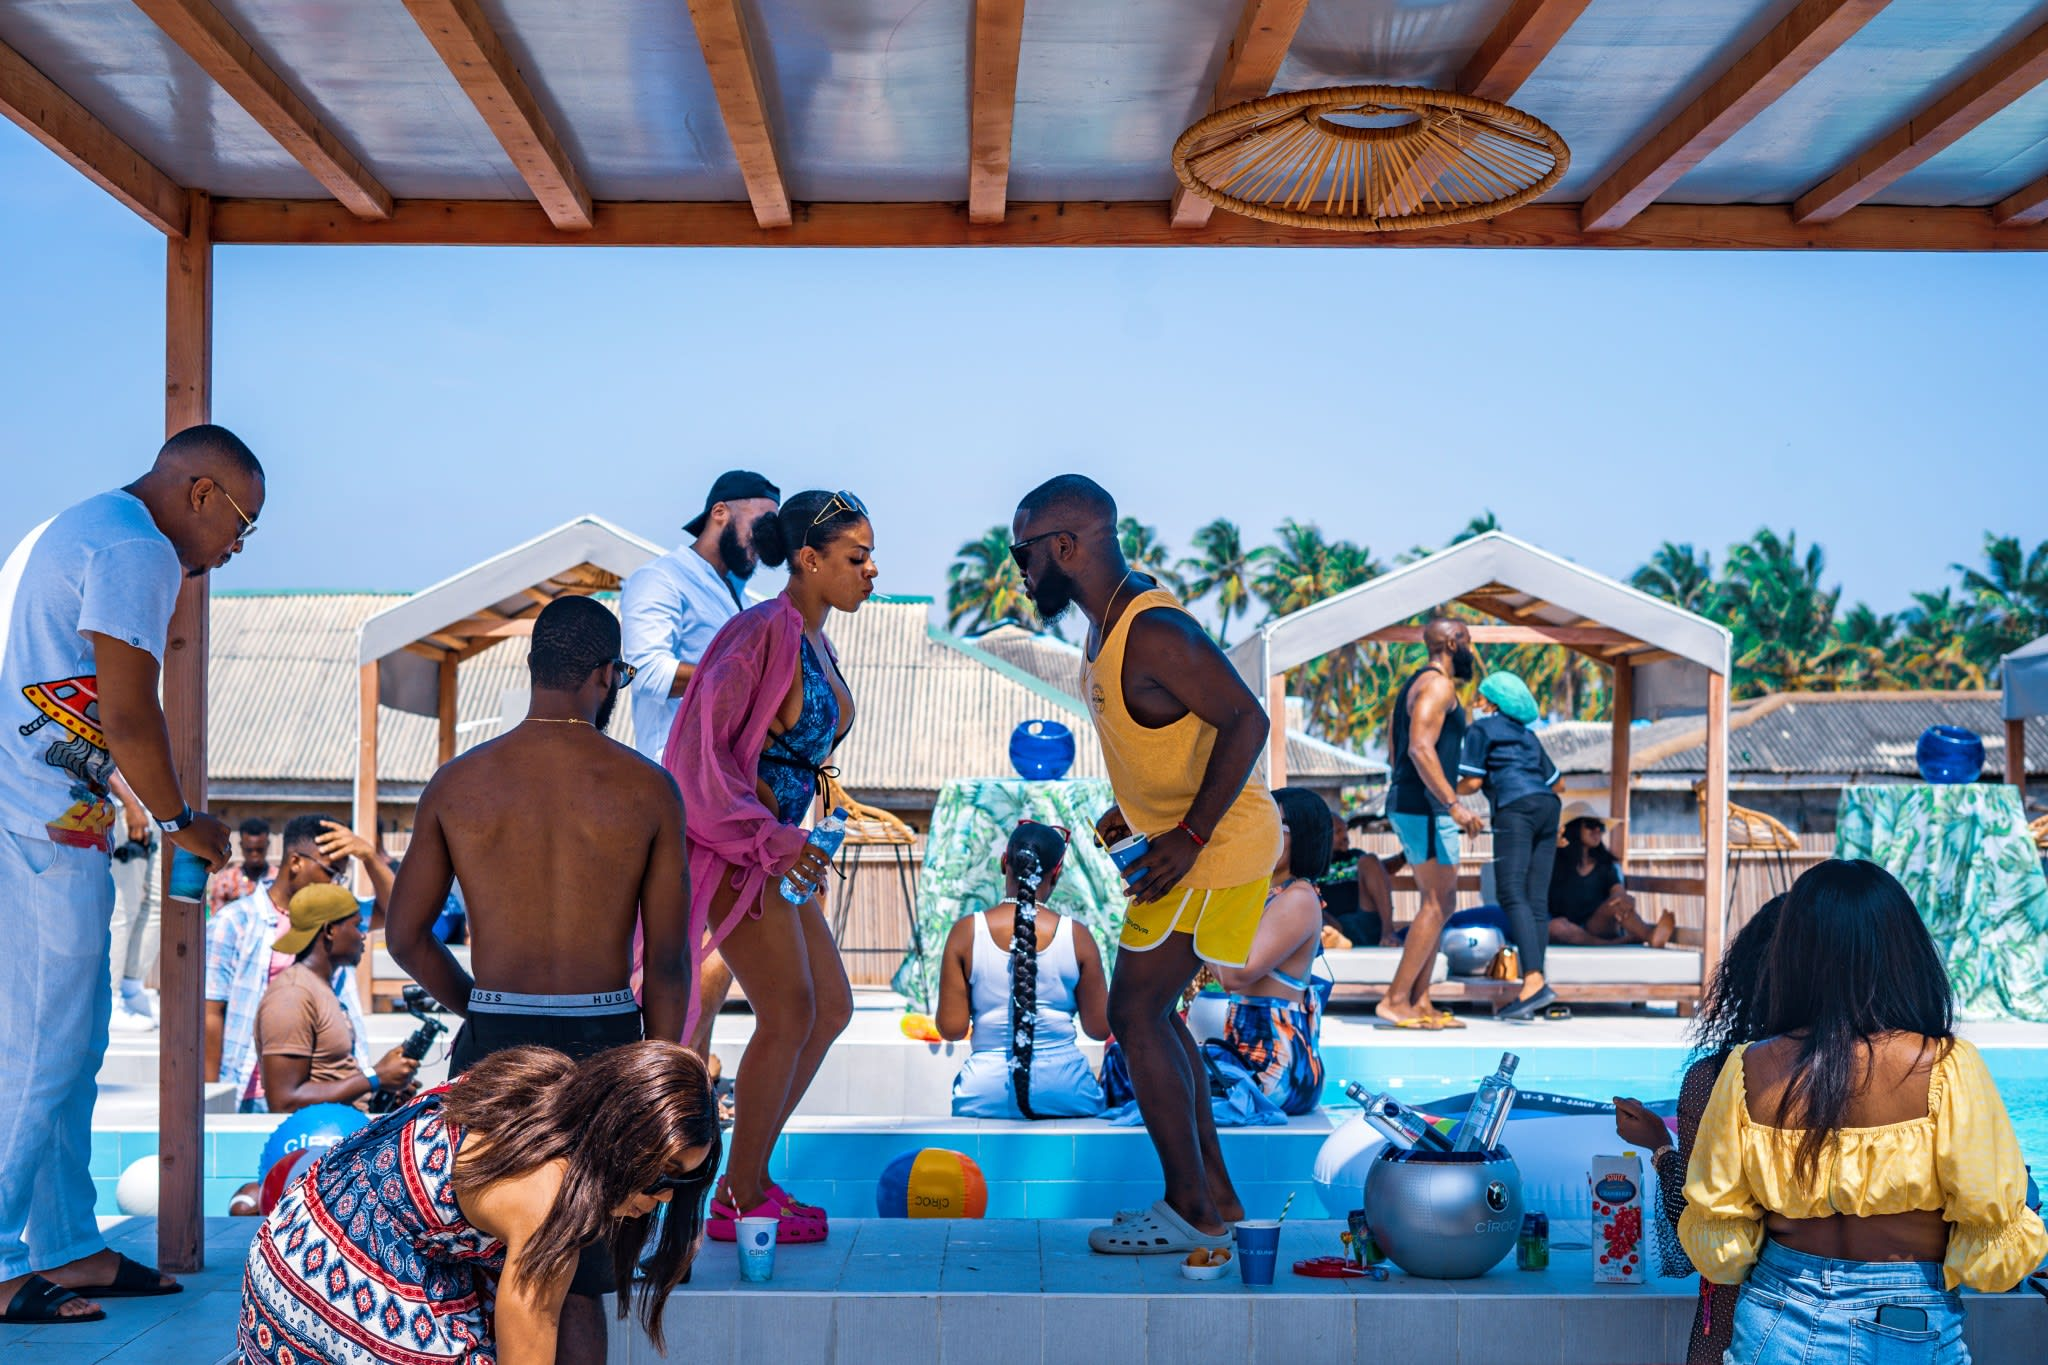 sunky ciroc party island